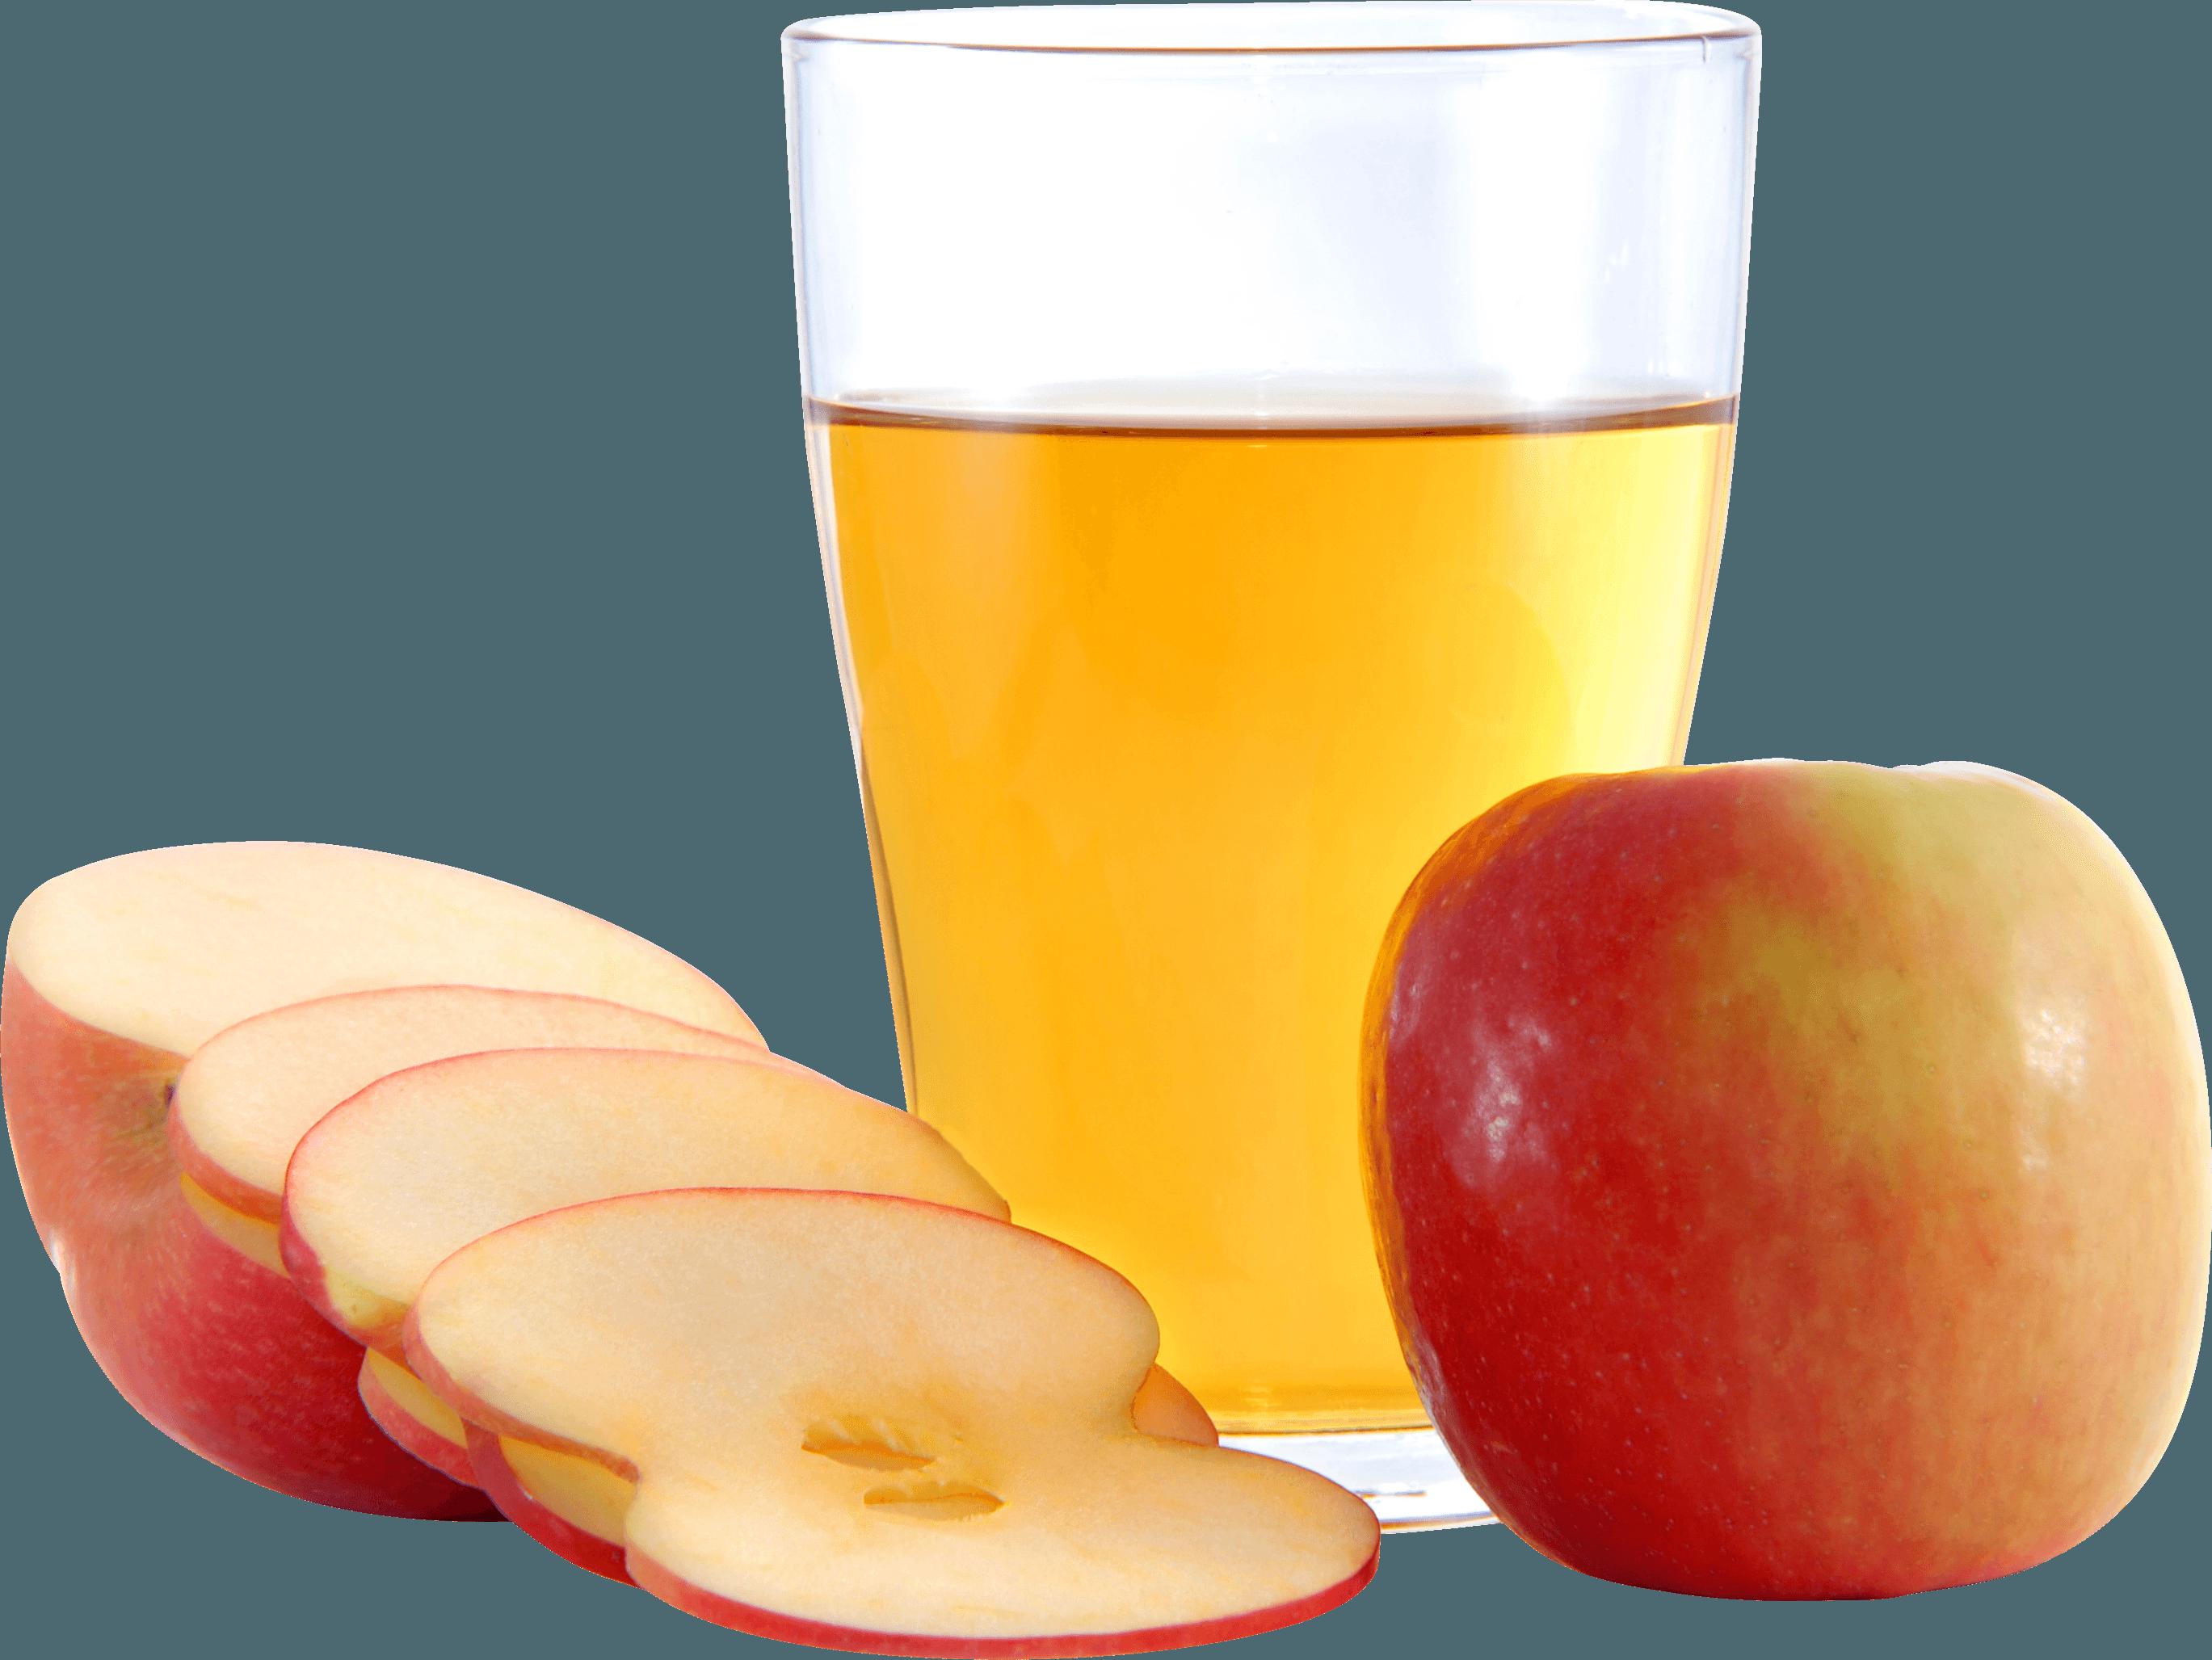 Apple Juice Png Image PNG Image - Juice PNG